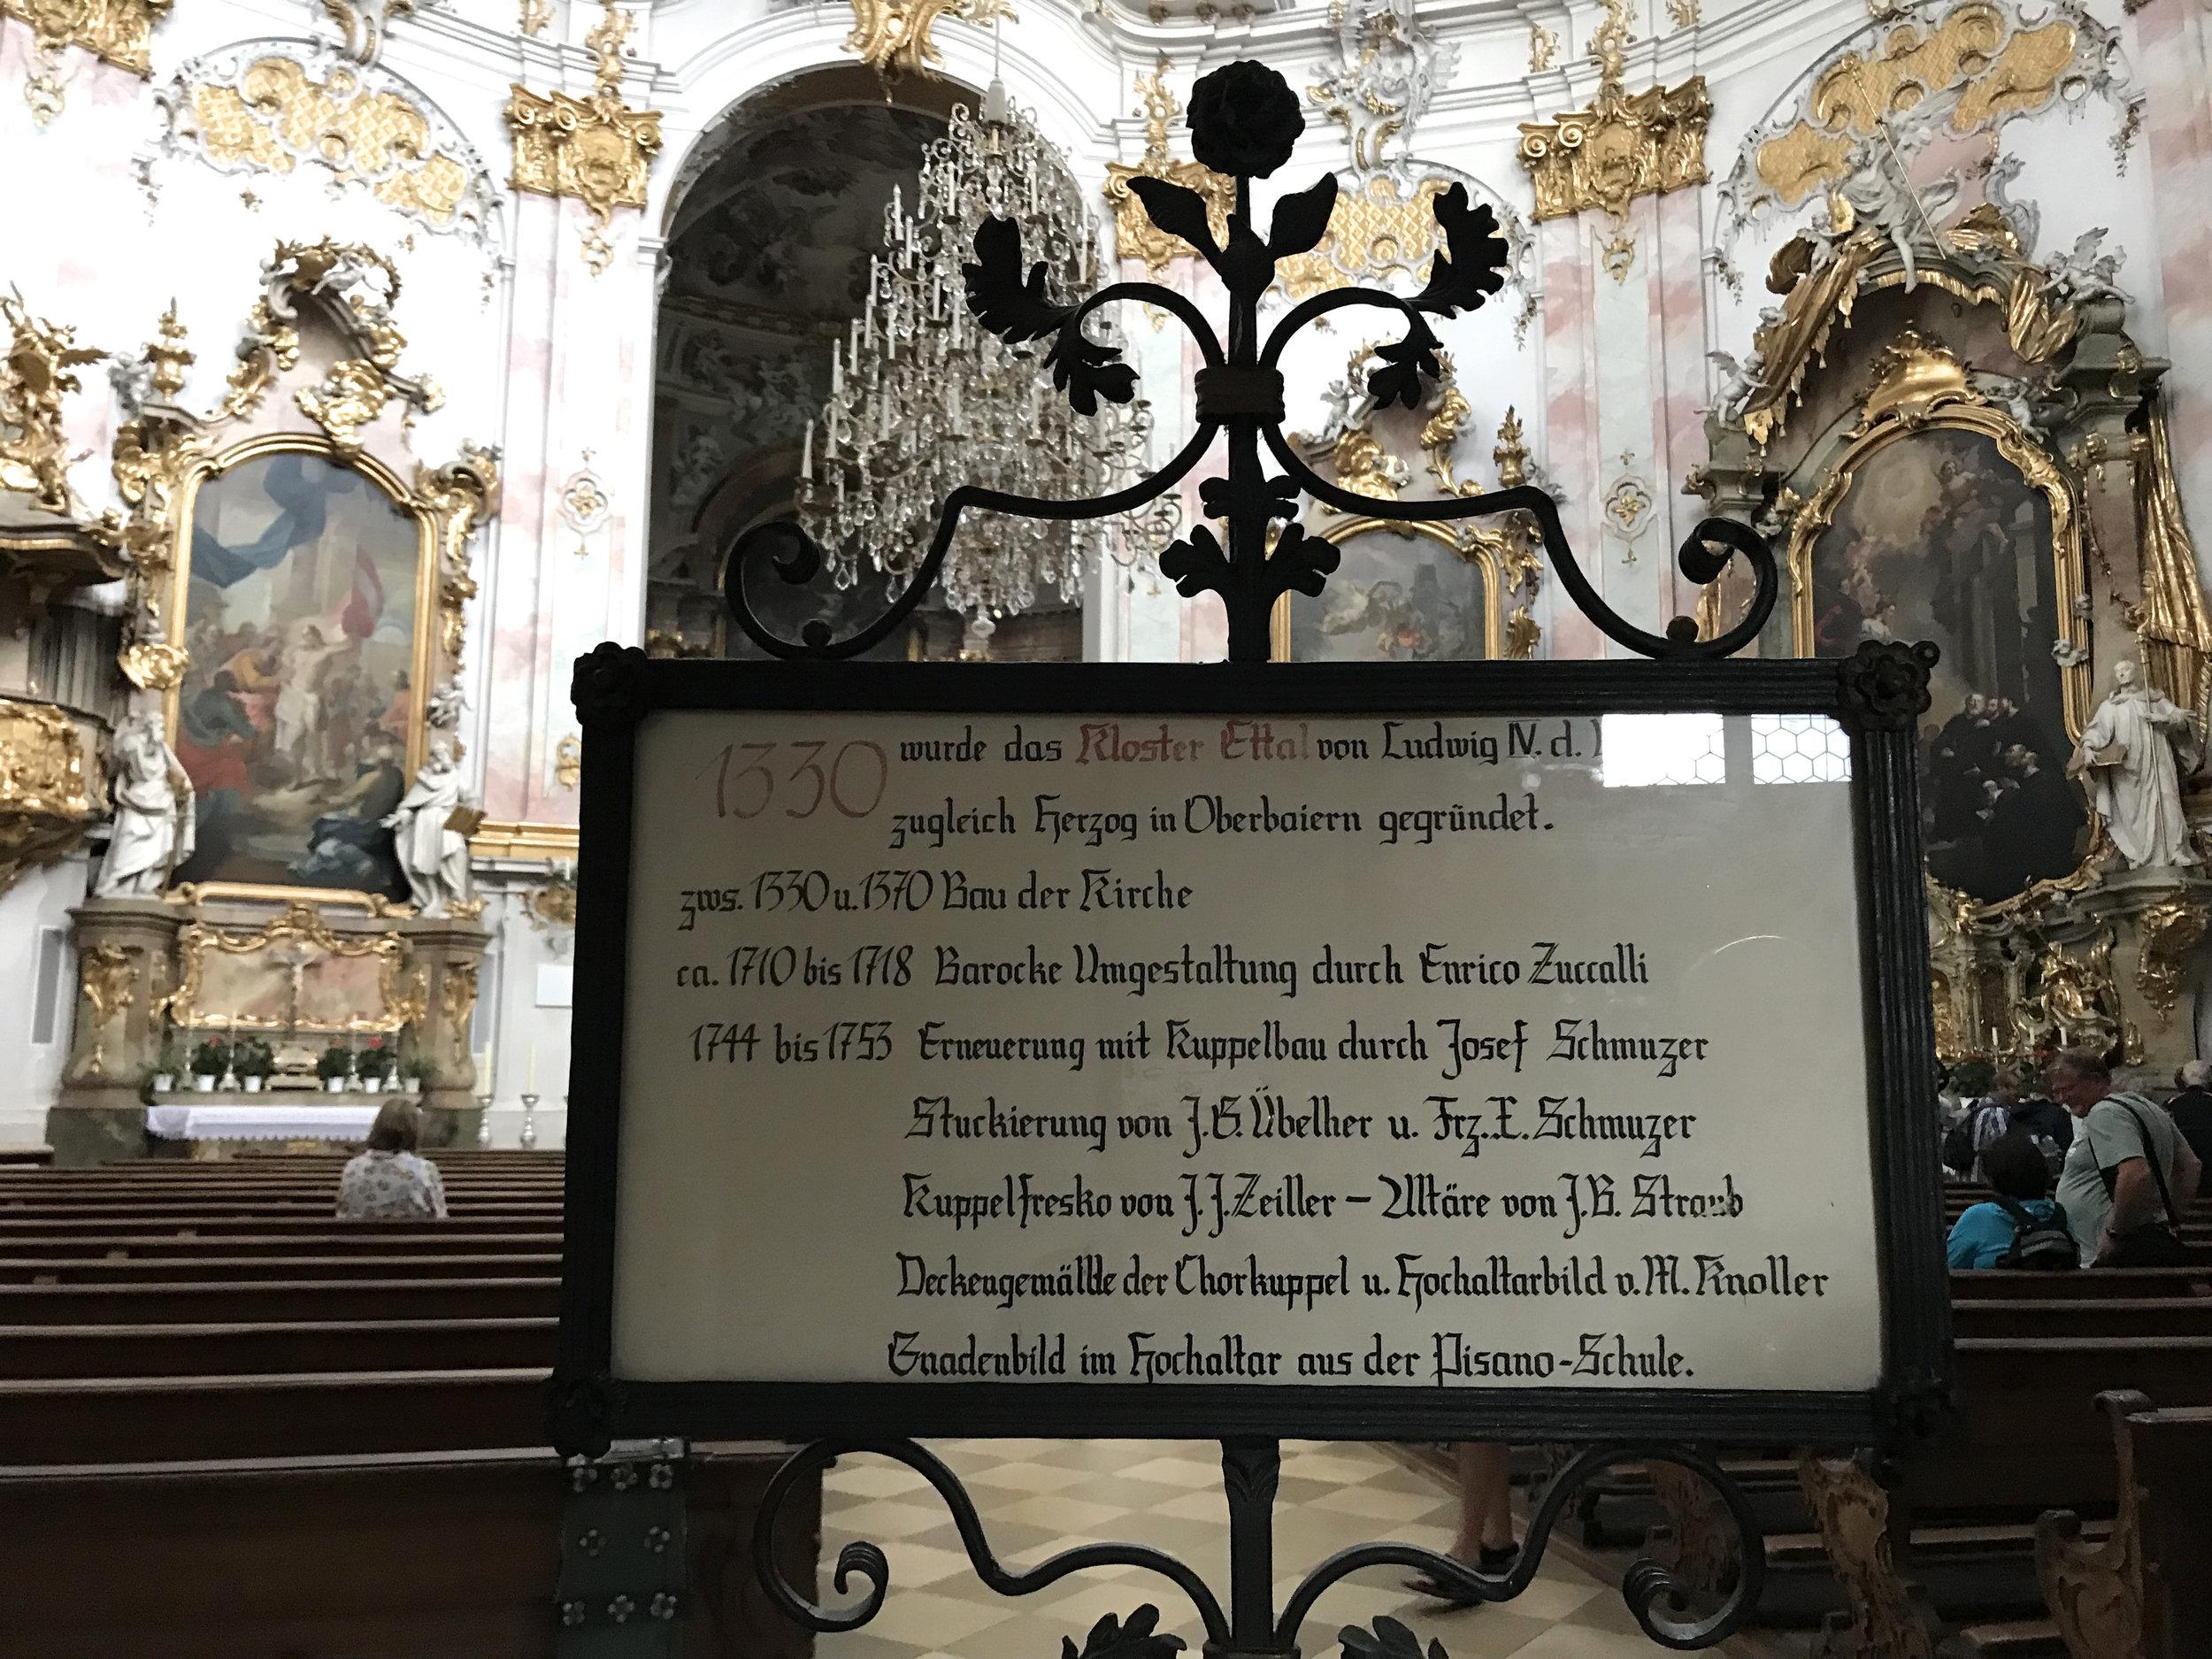 Teri_Bavaria_part3_monastery_spiritedtable_photo07.jpg